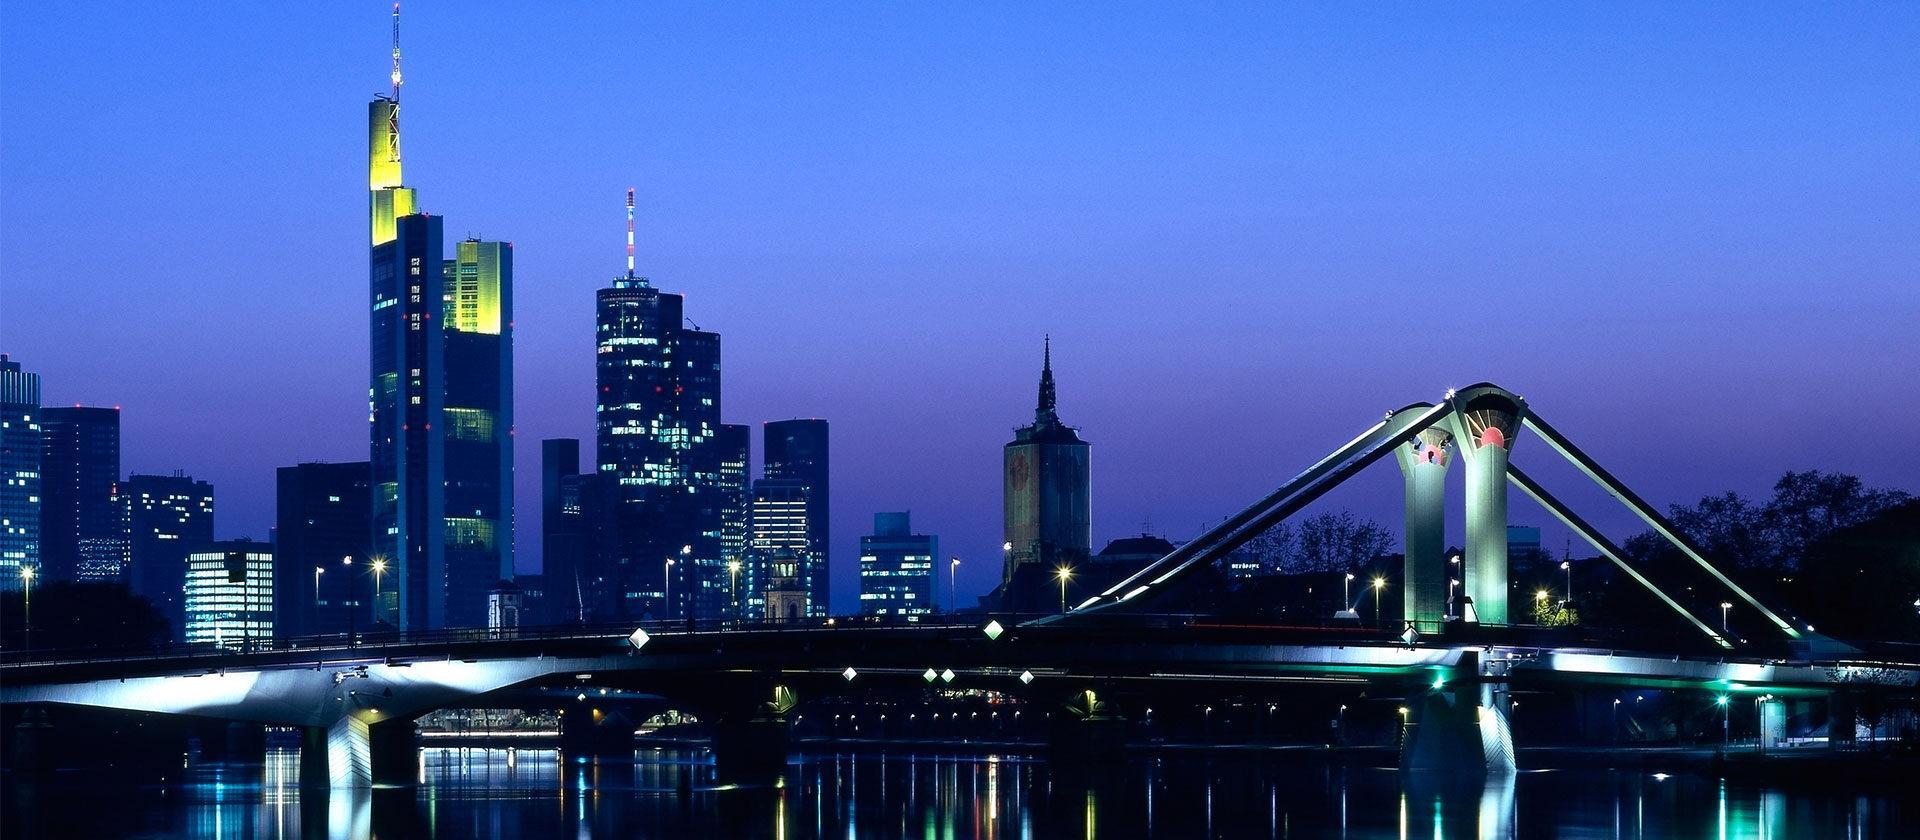 Lasik Germany Augenlaserzentrum Frankfurt